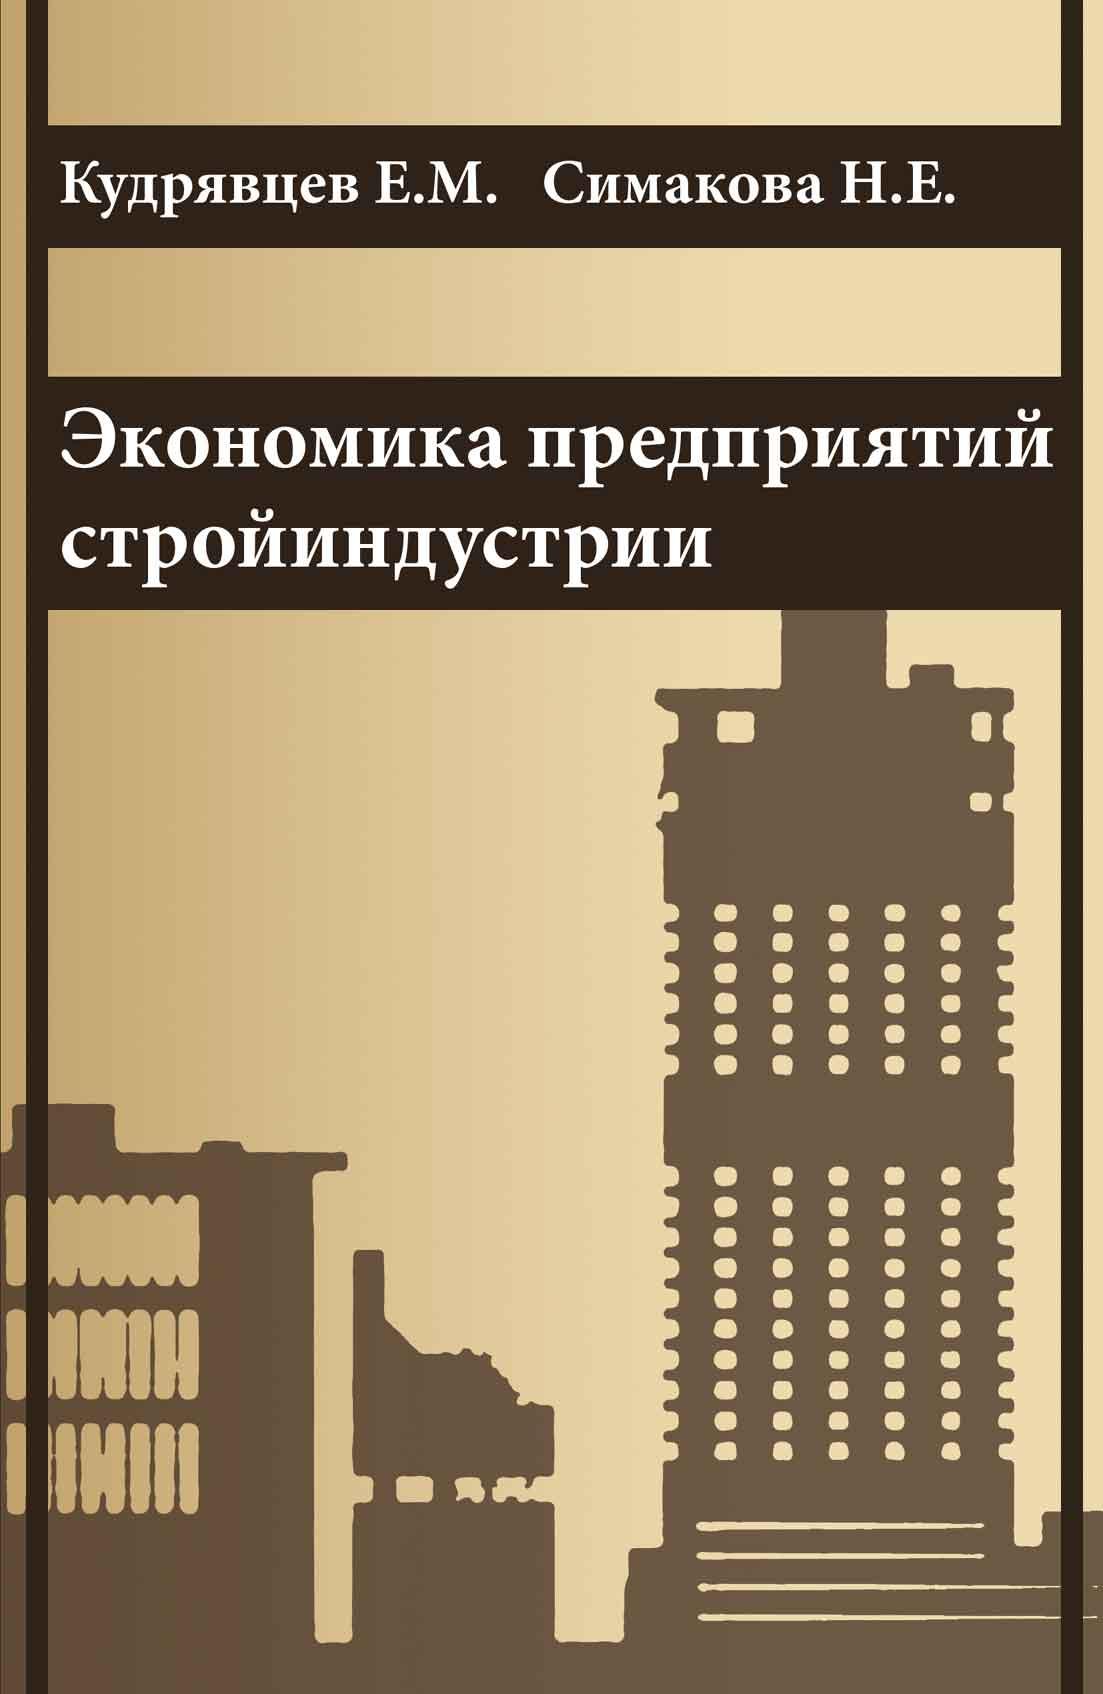 Е. М. Кудрявцев Экономика предприятий стройиндустрии (с примерами расчетов, в том числе и на компьютере)